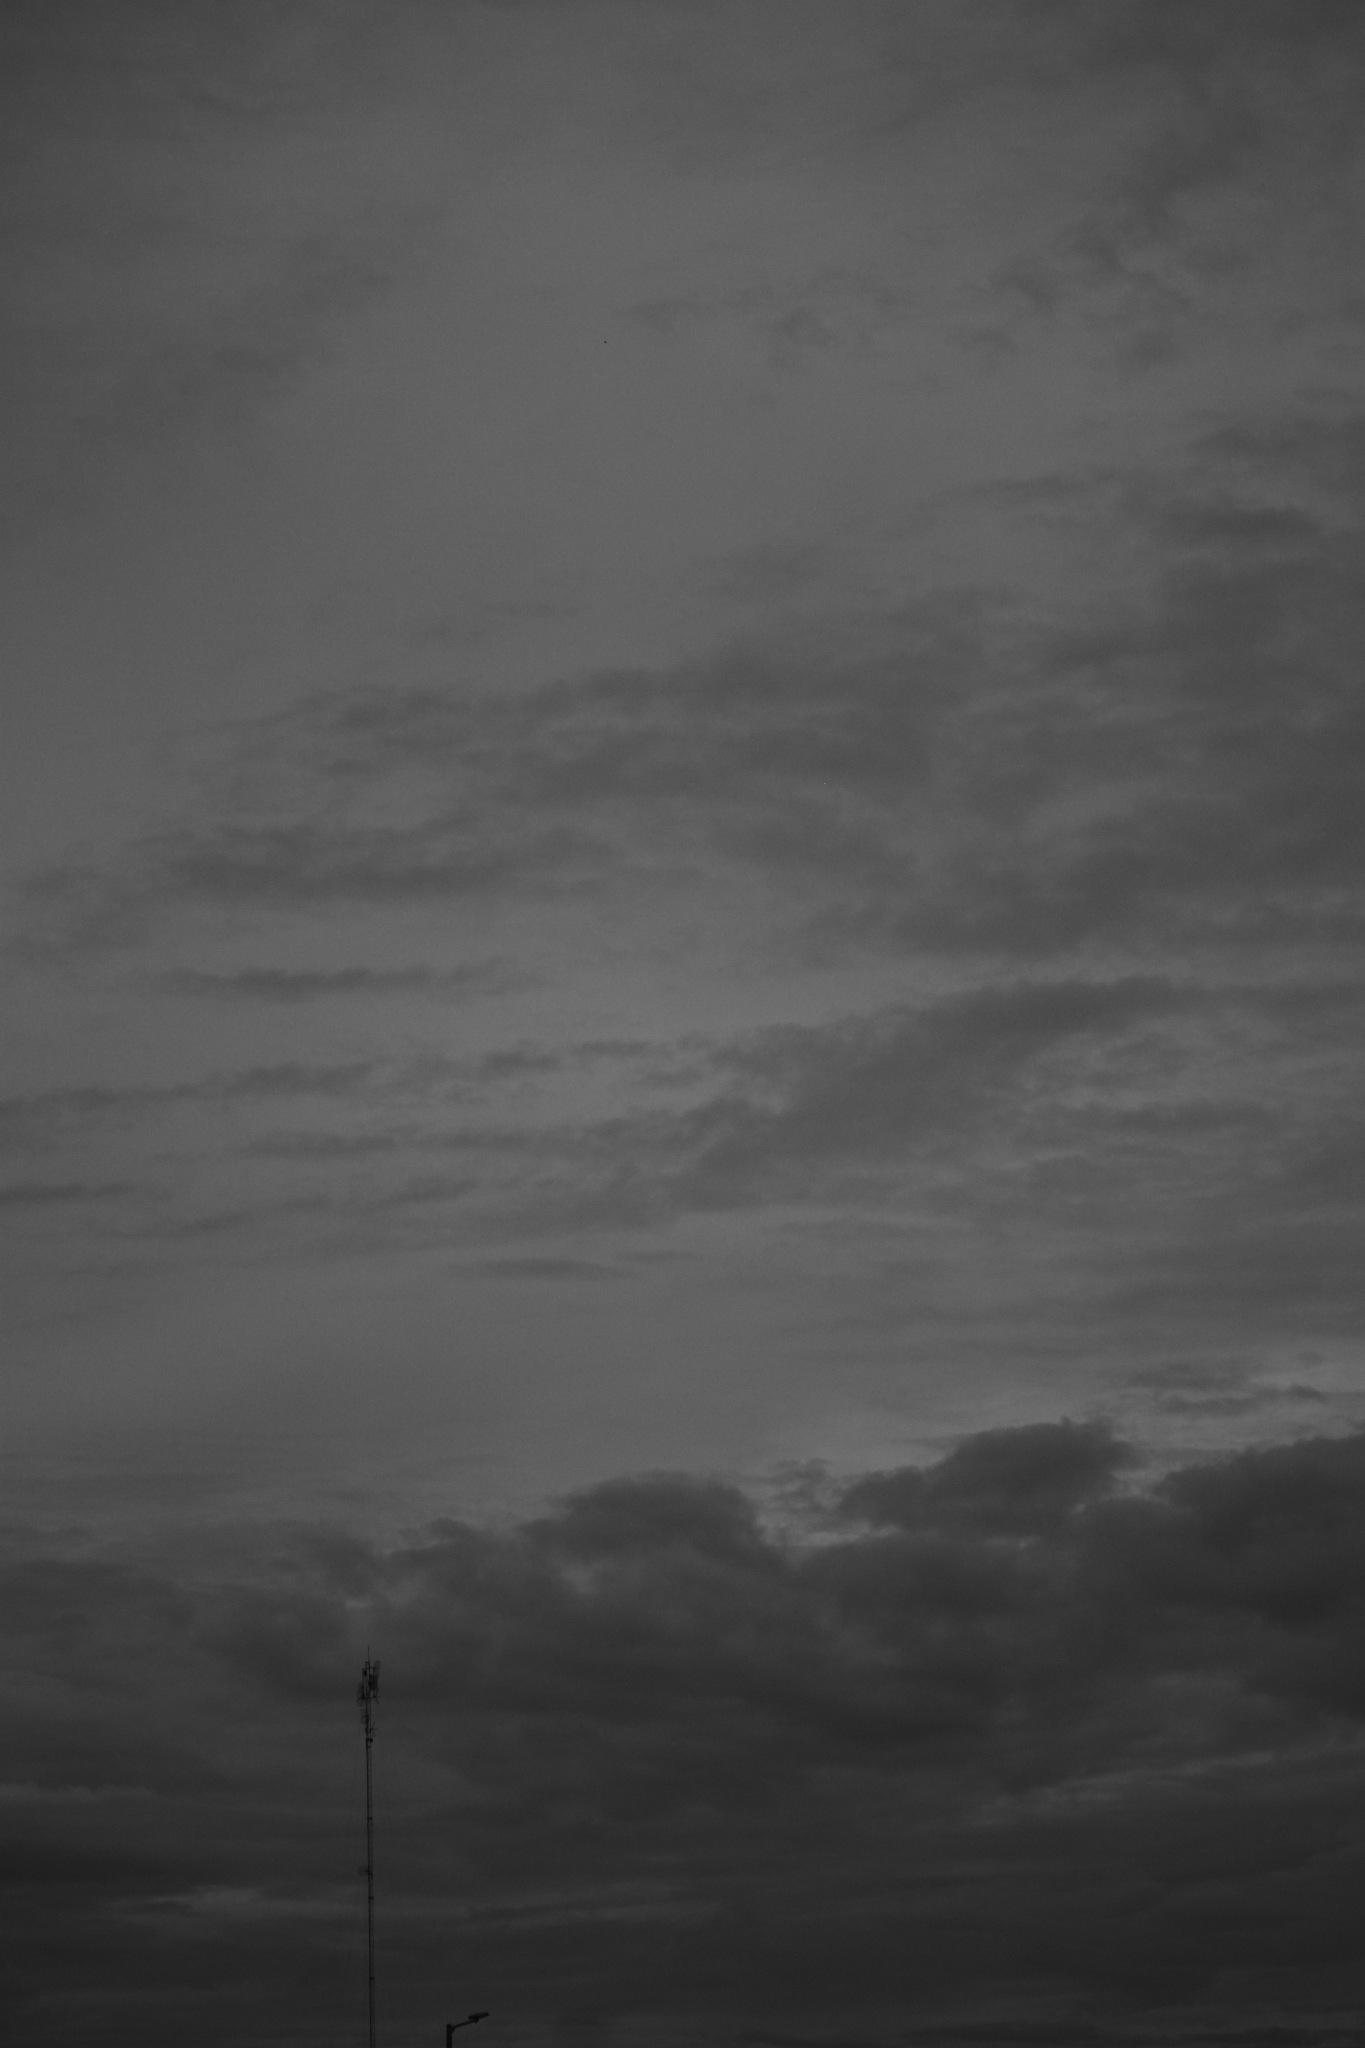 pngen ujan  by Harisfarhan Jonior Editing